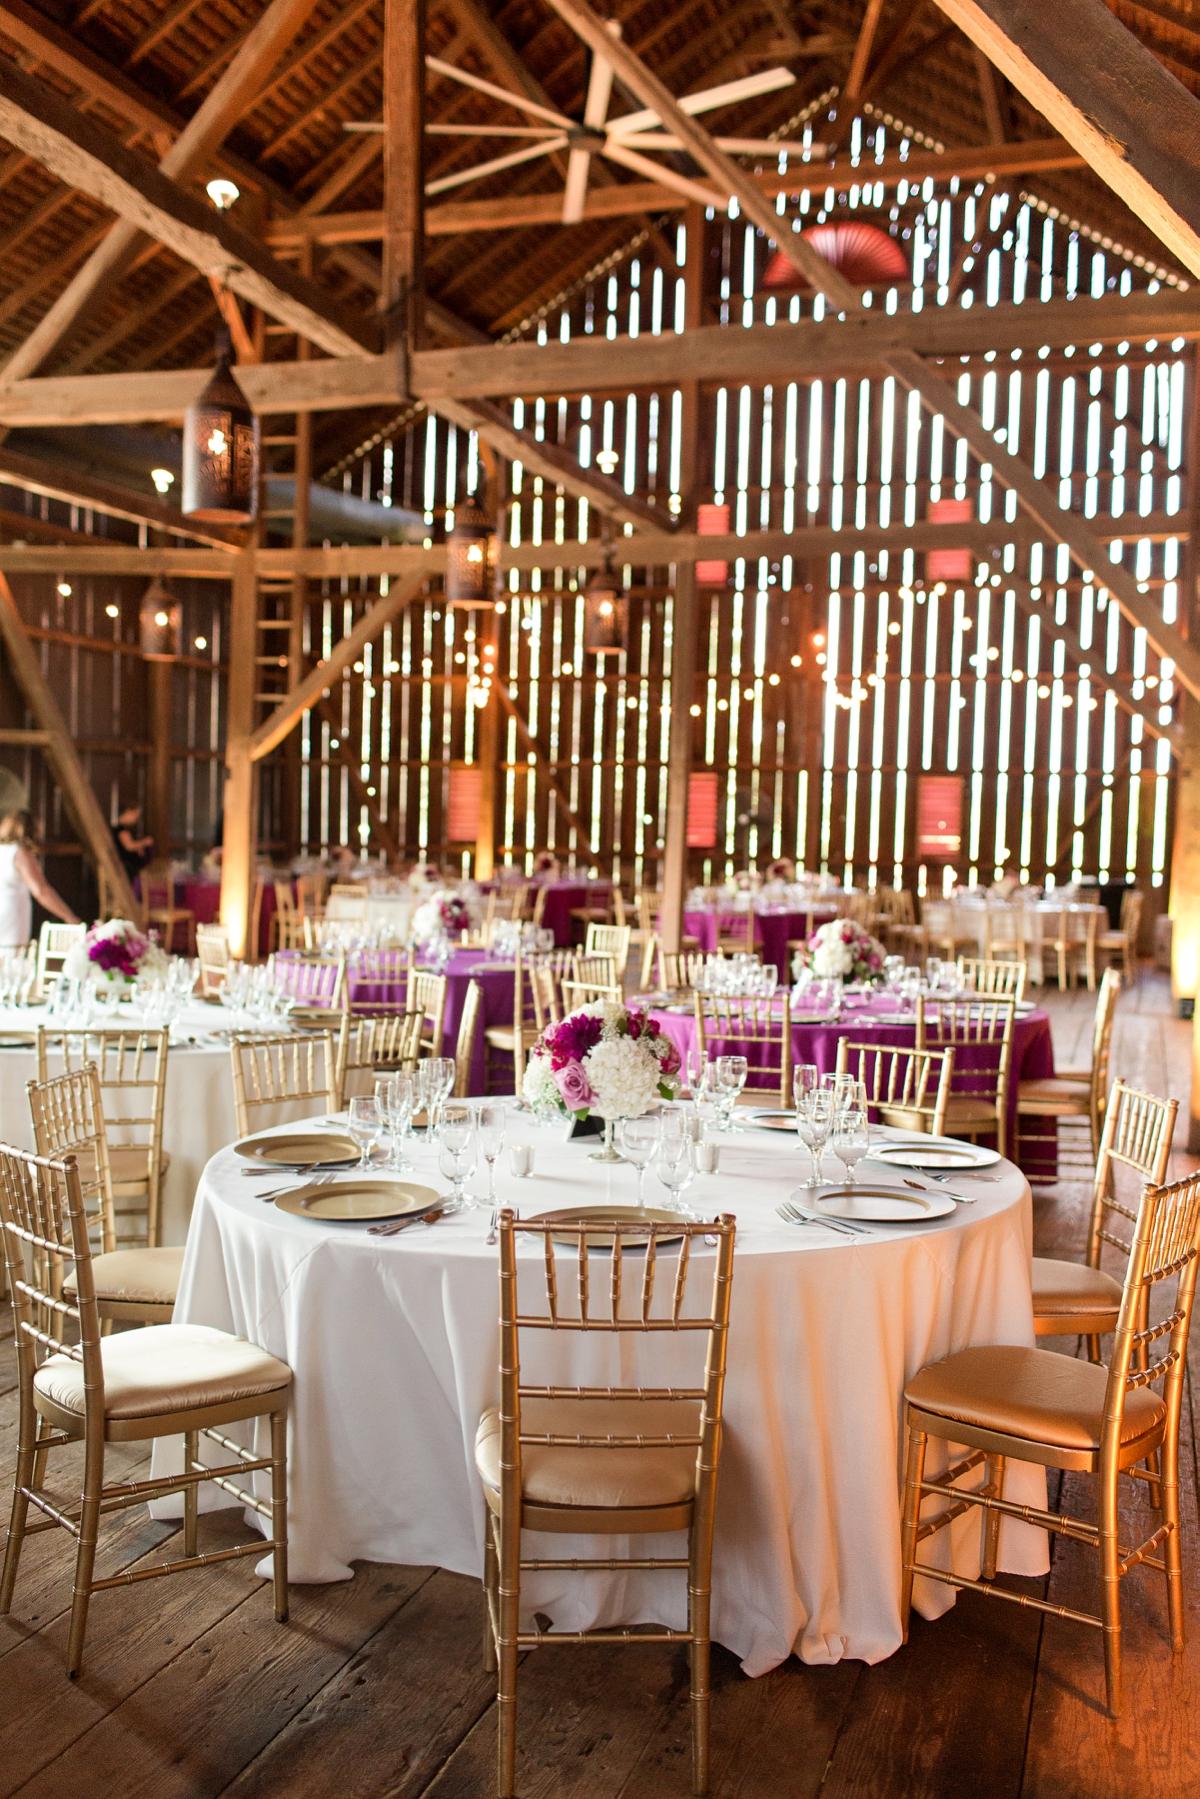 DREAM BARN WEDDING RECEPTION. Riverside On the Potomac Barn Wedding Photos. DC Barn Wedding. DC Farm Wedding. Outdoor Ceremony, Indoor Reception.